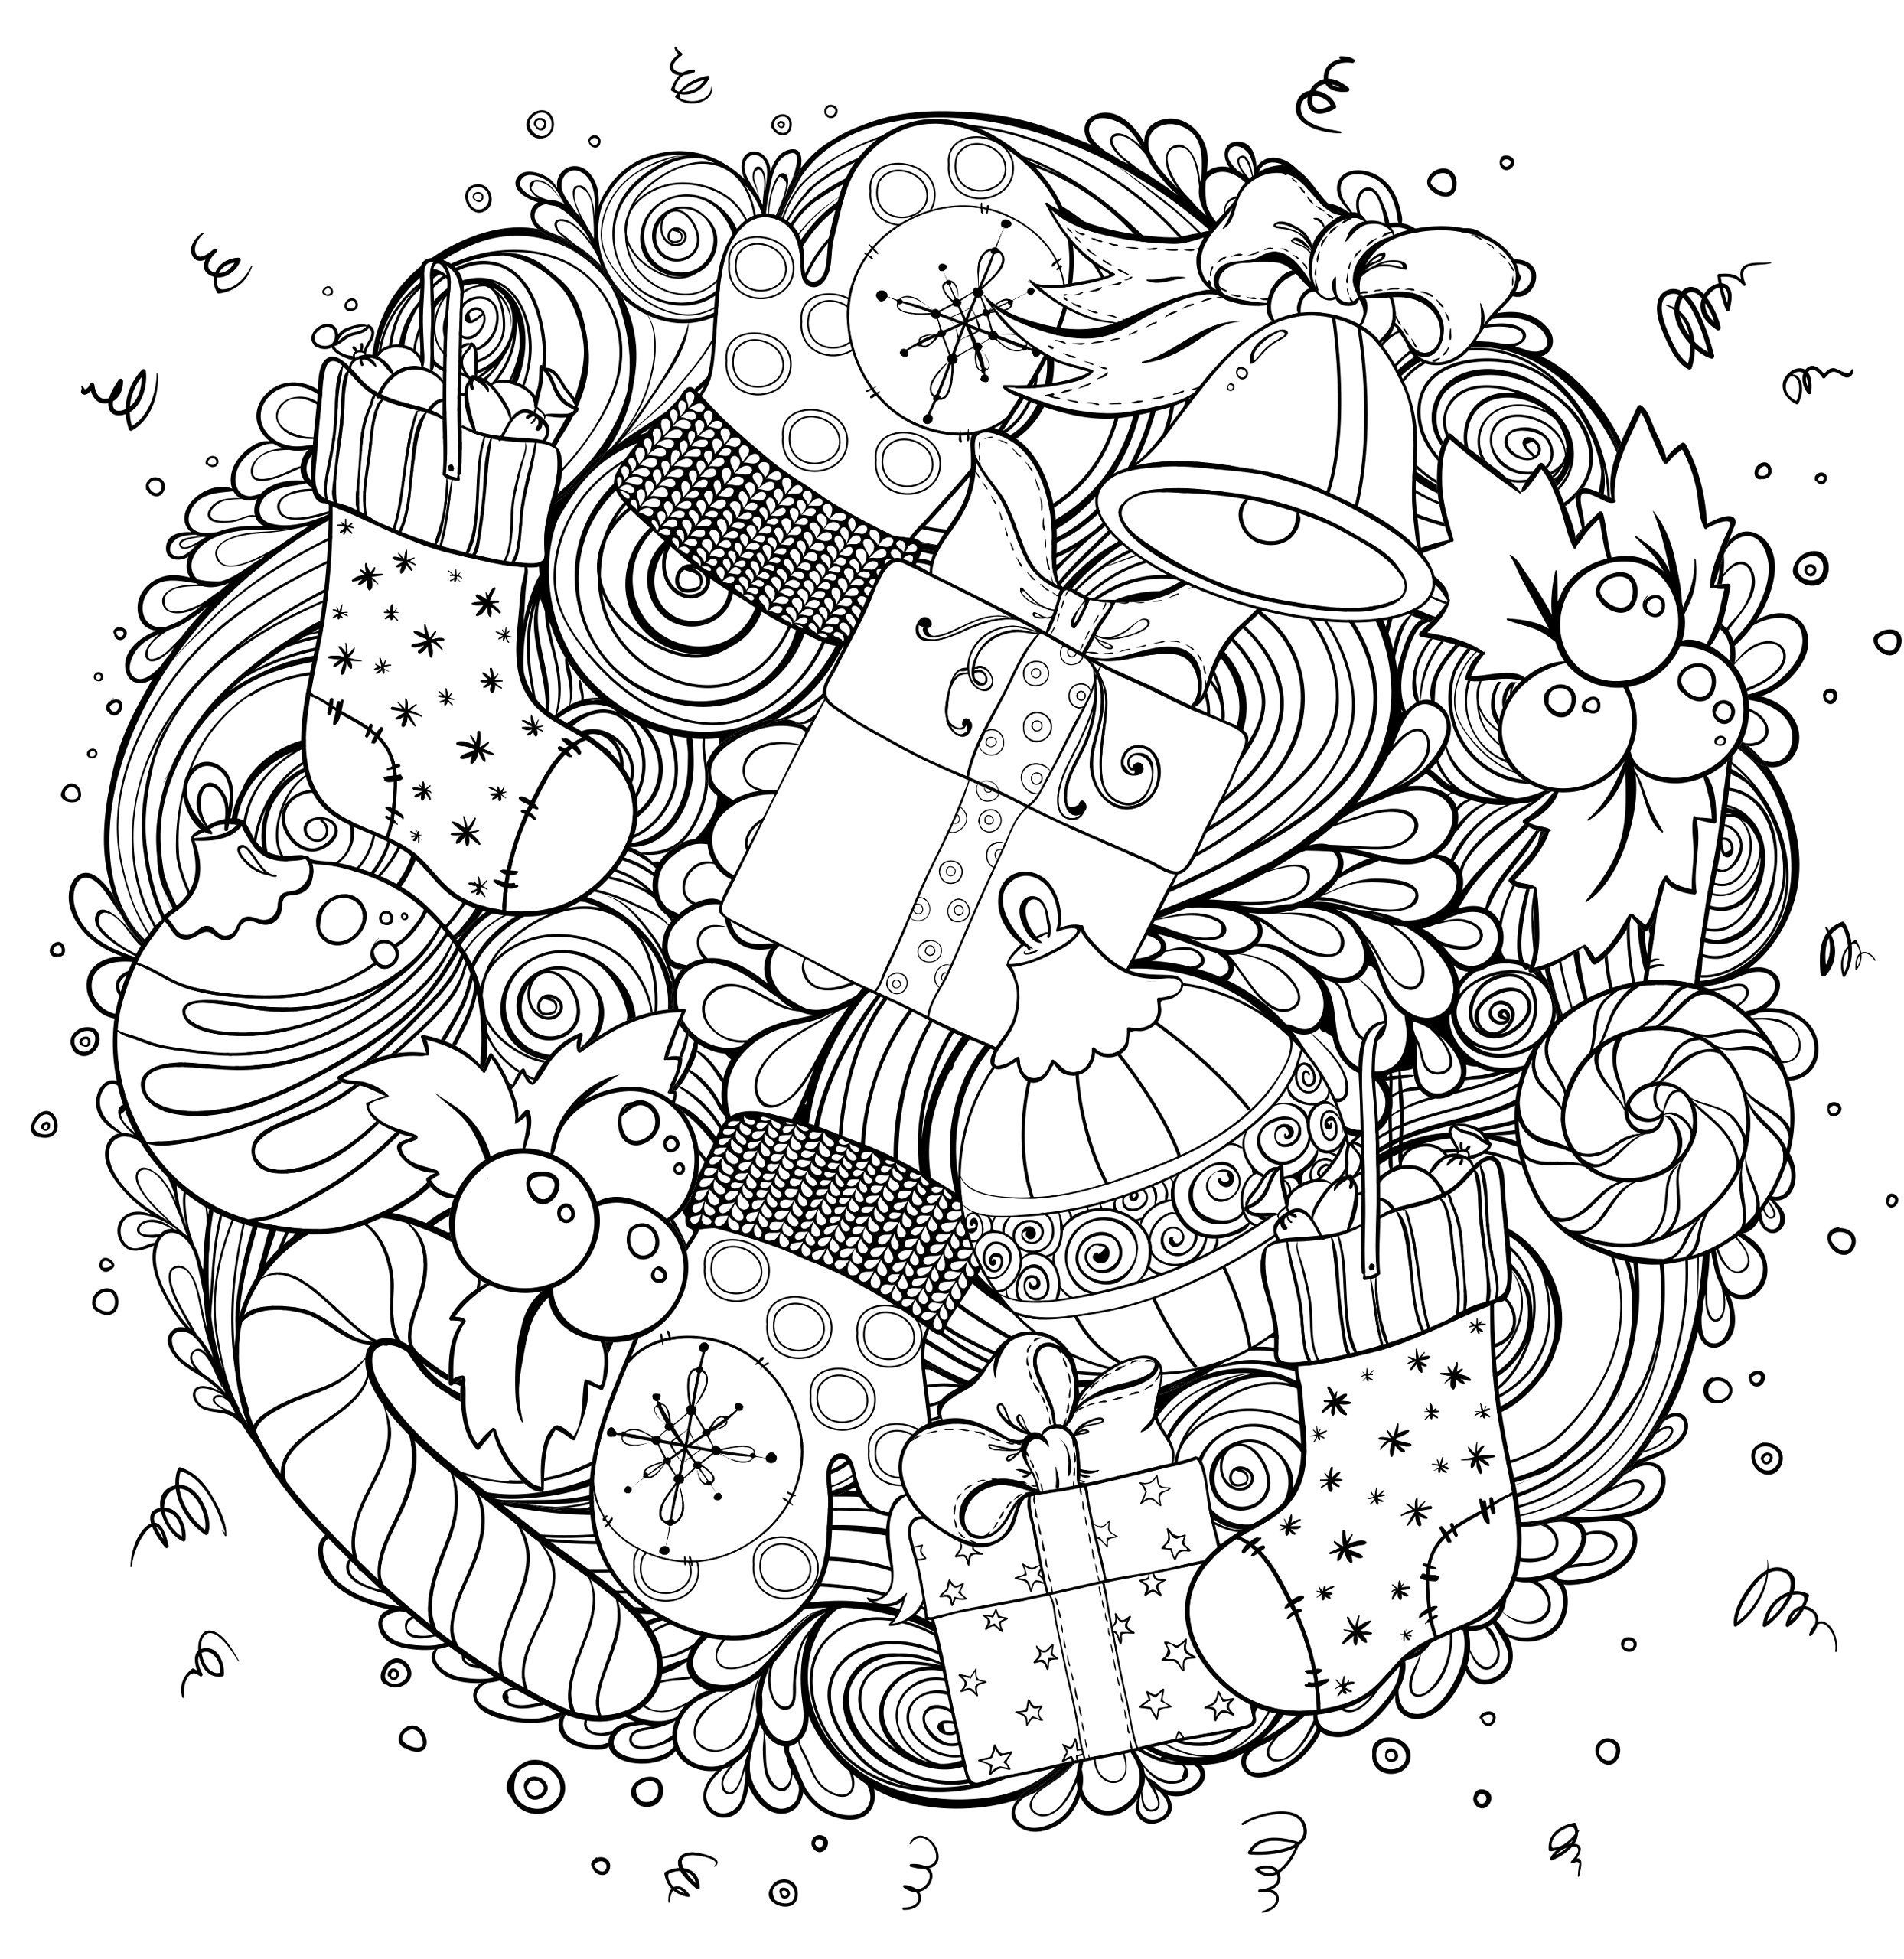 Amazon Com Christmas Designs Adult Coloring Book 31 Stress Relieving Designs Studio 9781441319326 P Raskraski Knizhka Raskraska Rozhdestvenskie Raskraski